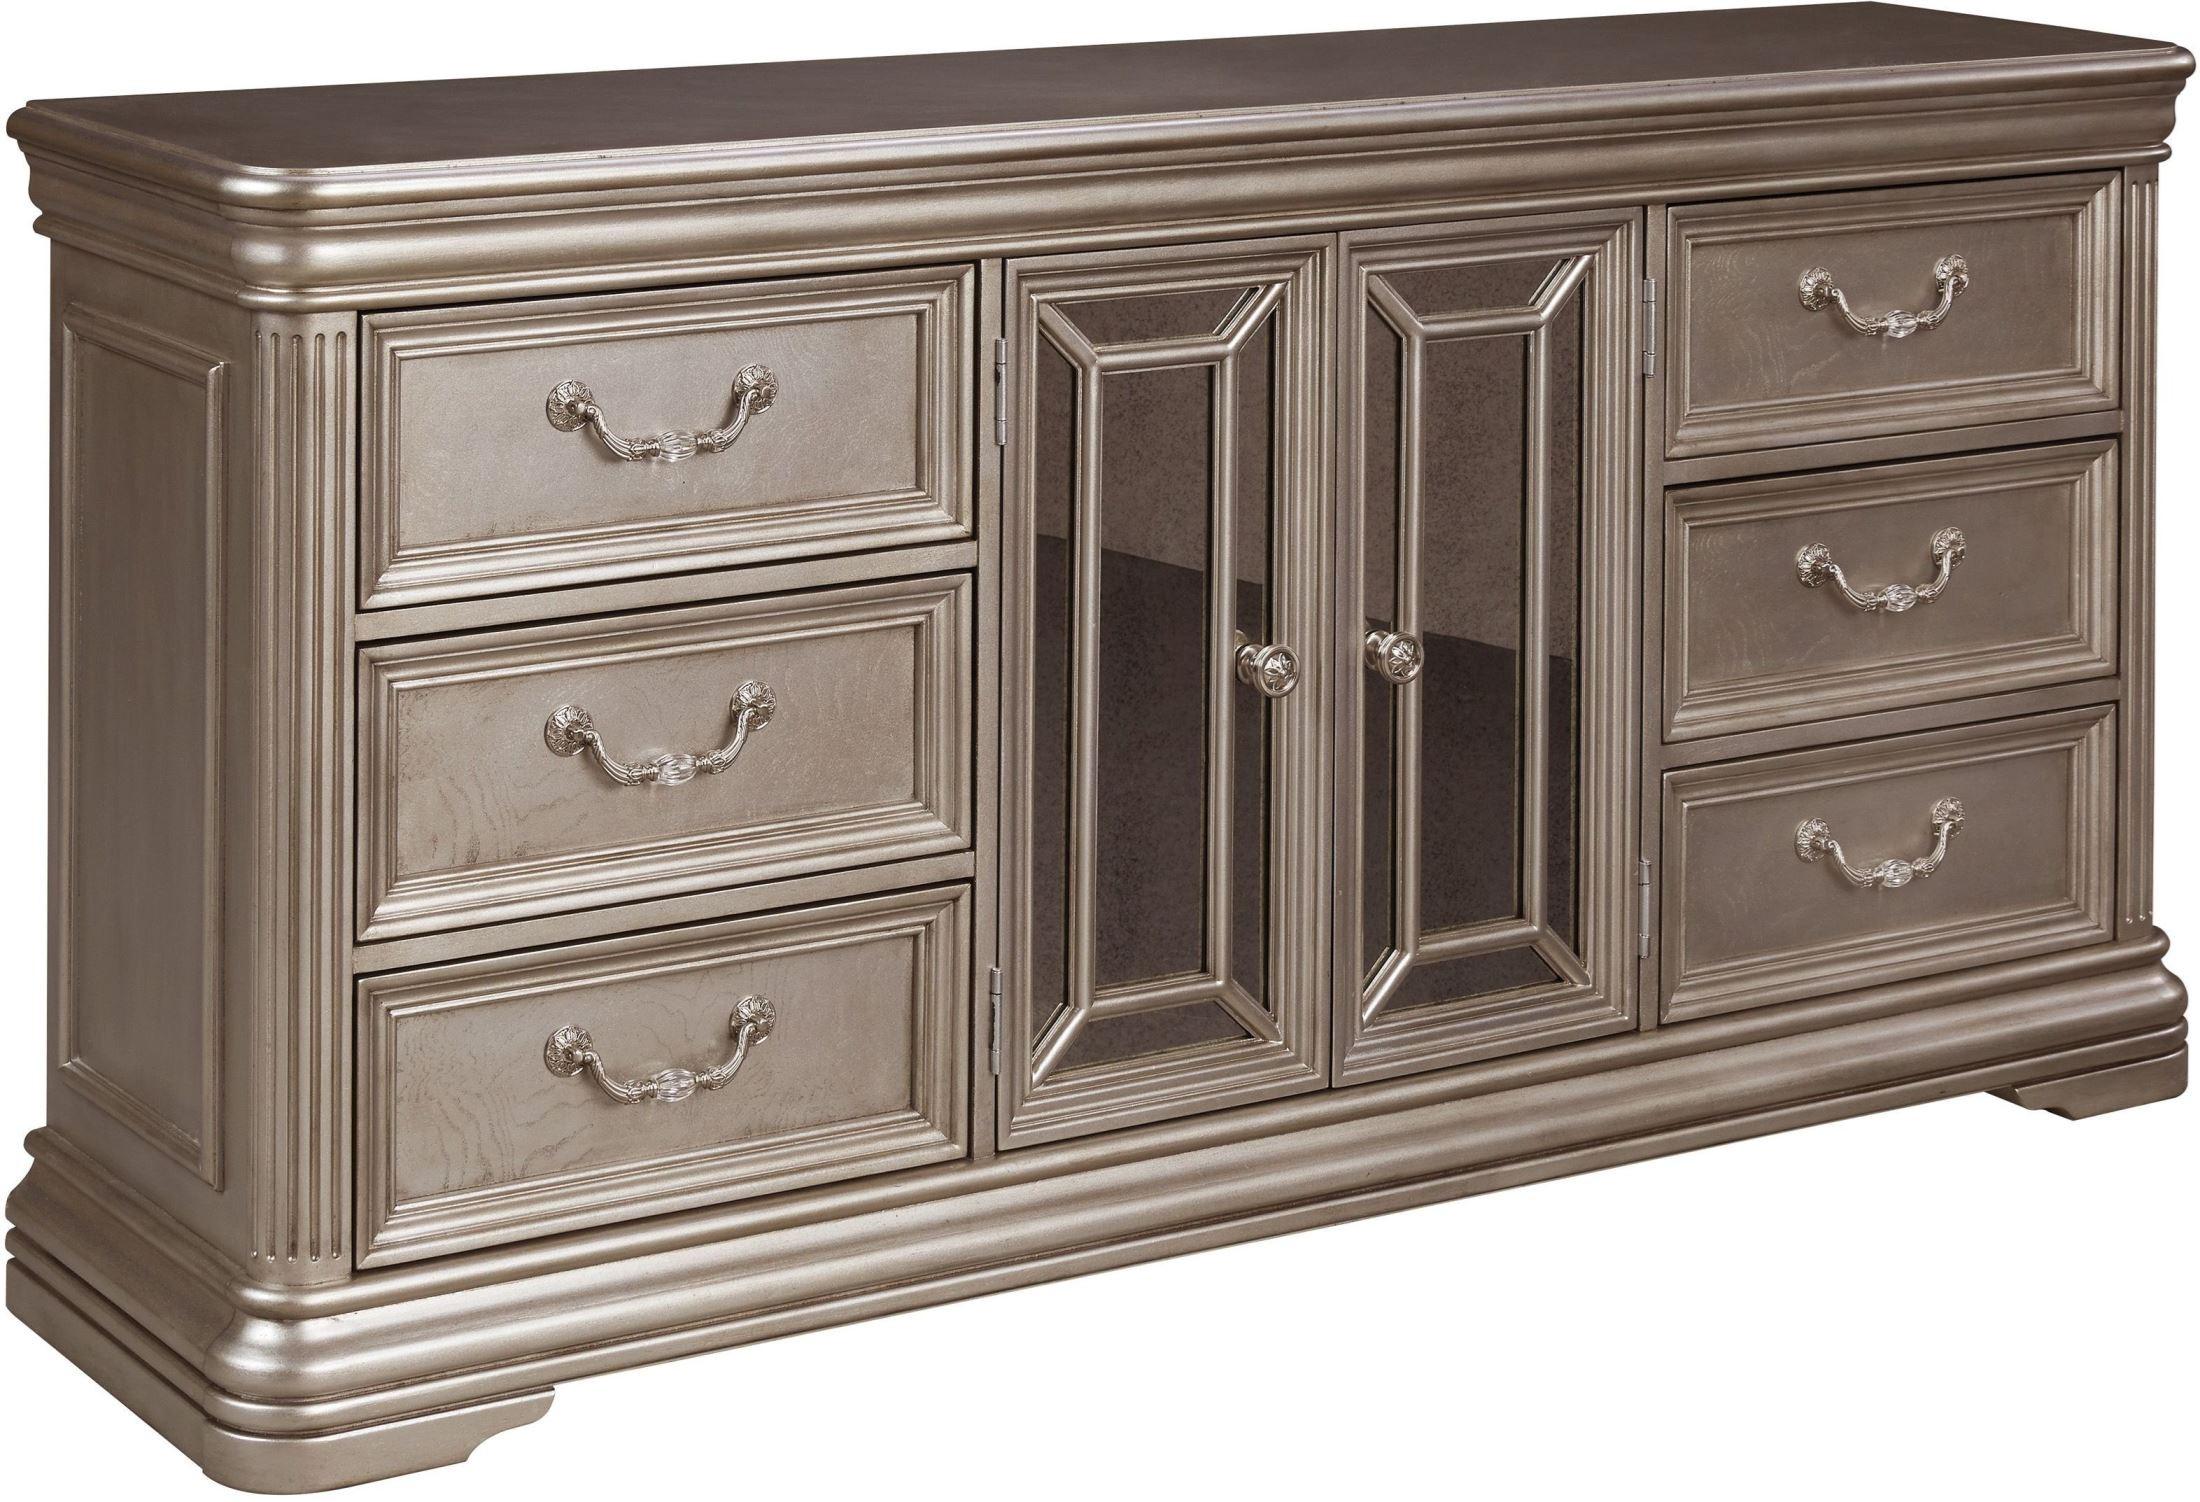 Birlanny Silver Dresser from Ashley  Coleman Furniture